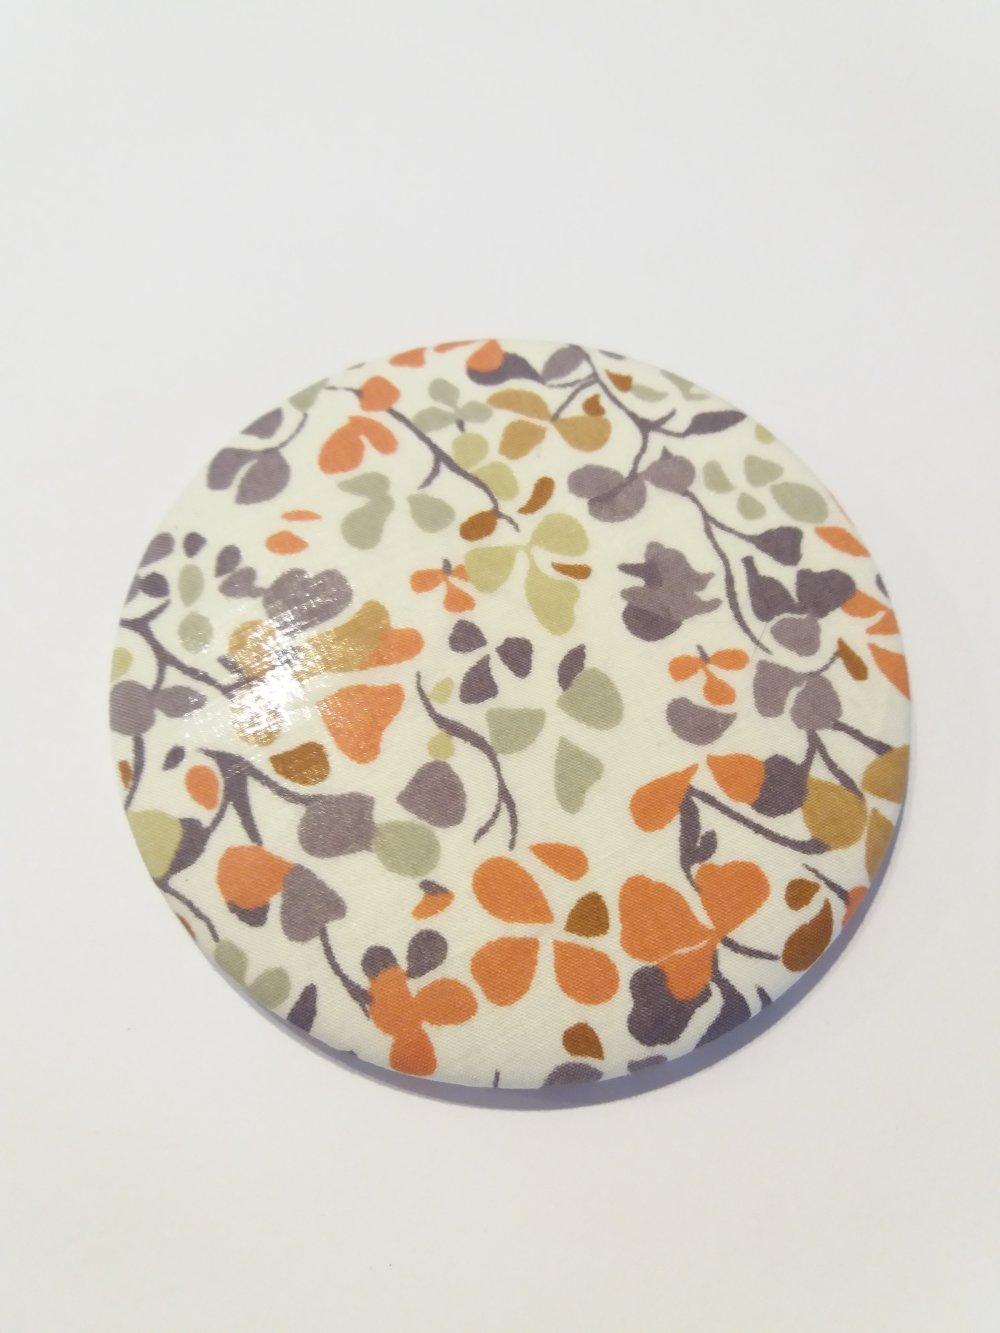 Miroir de sac décor tissus motifs fleurs liberty - Fait main